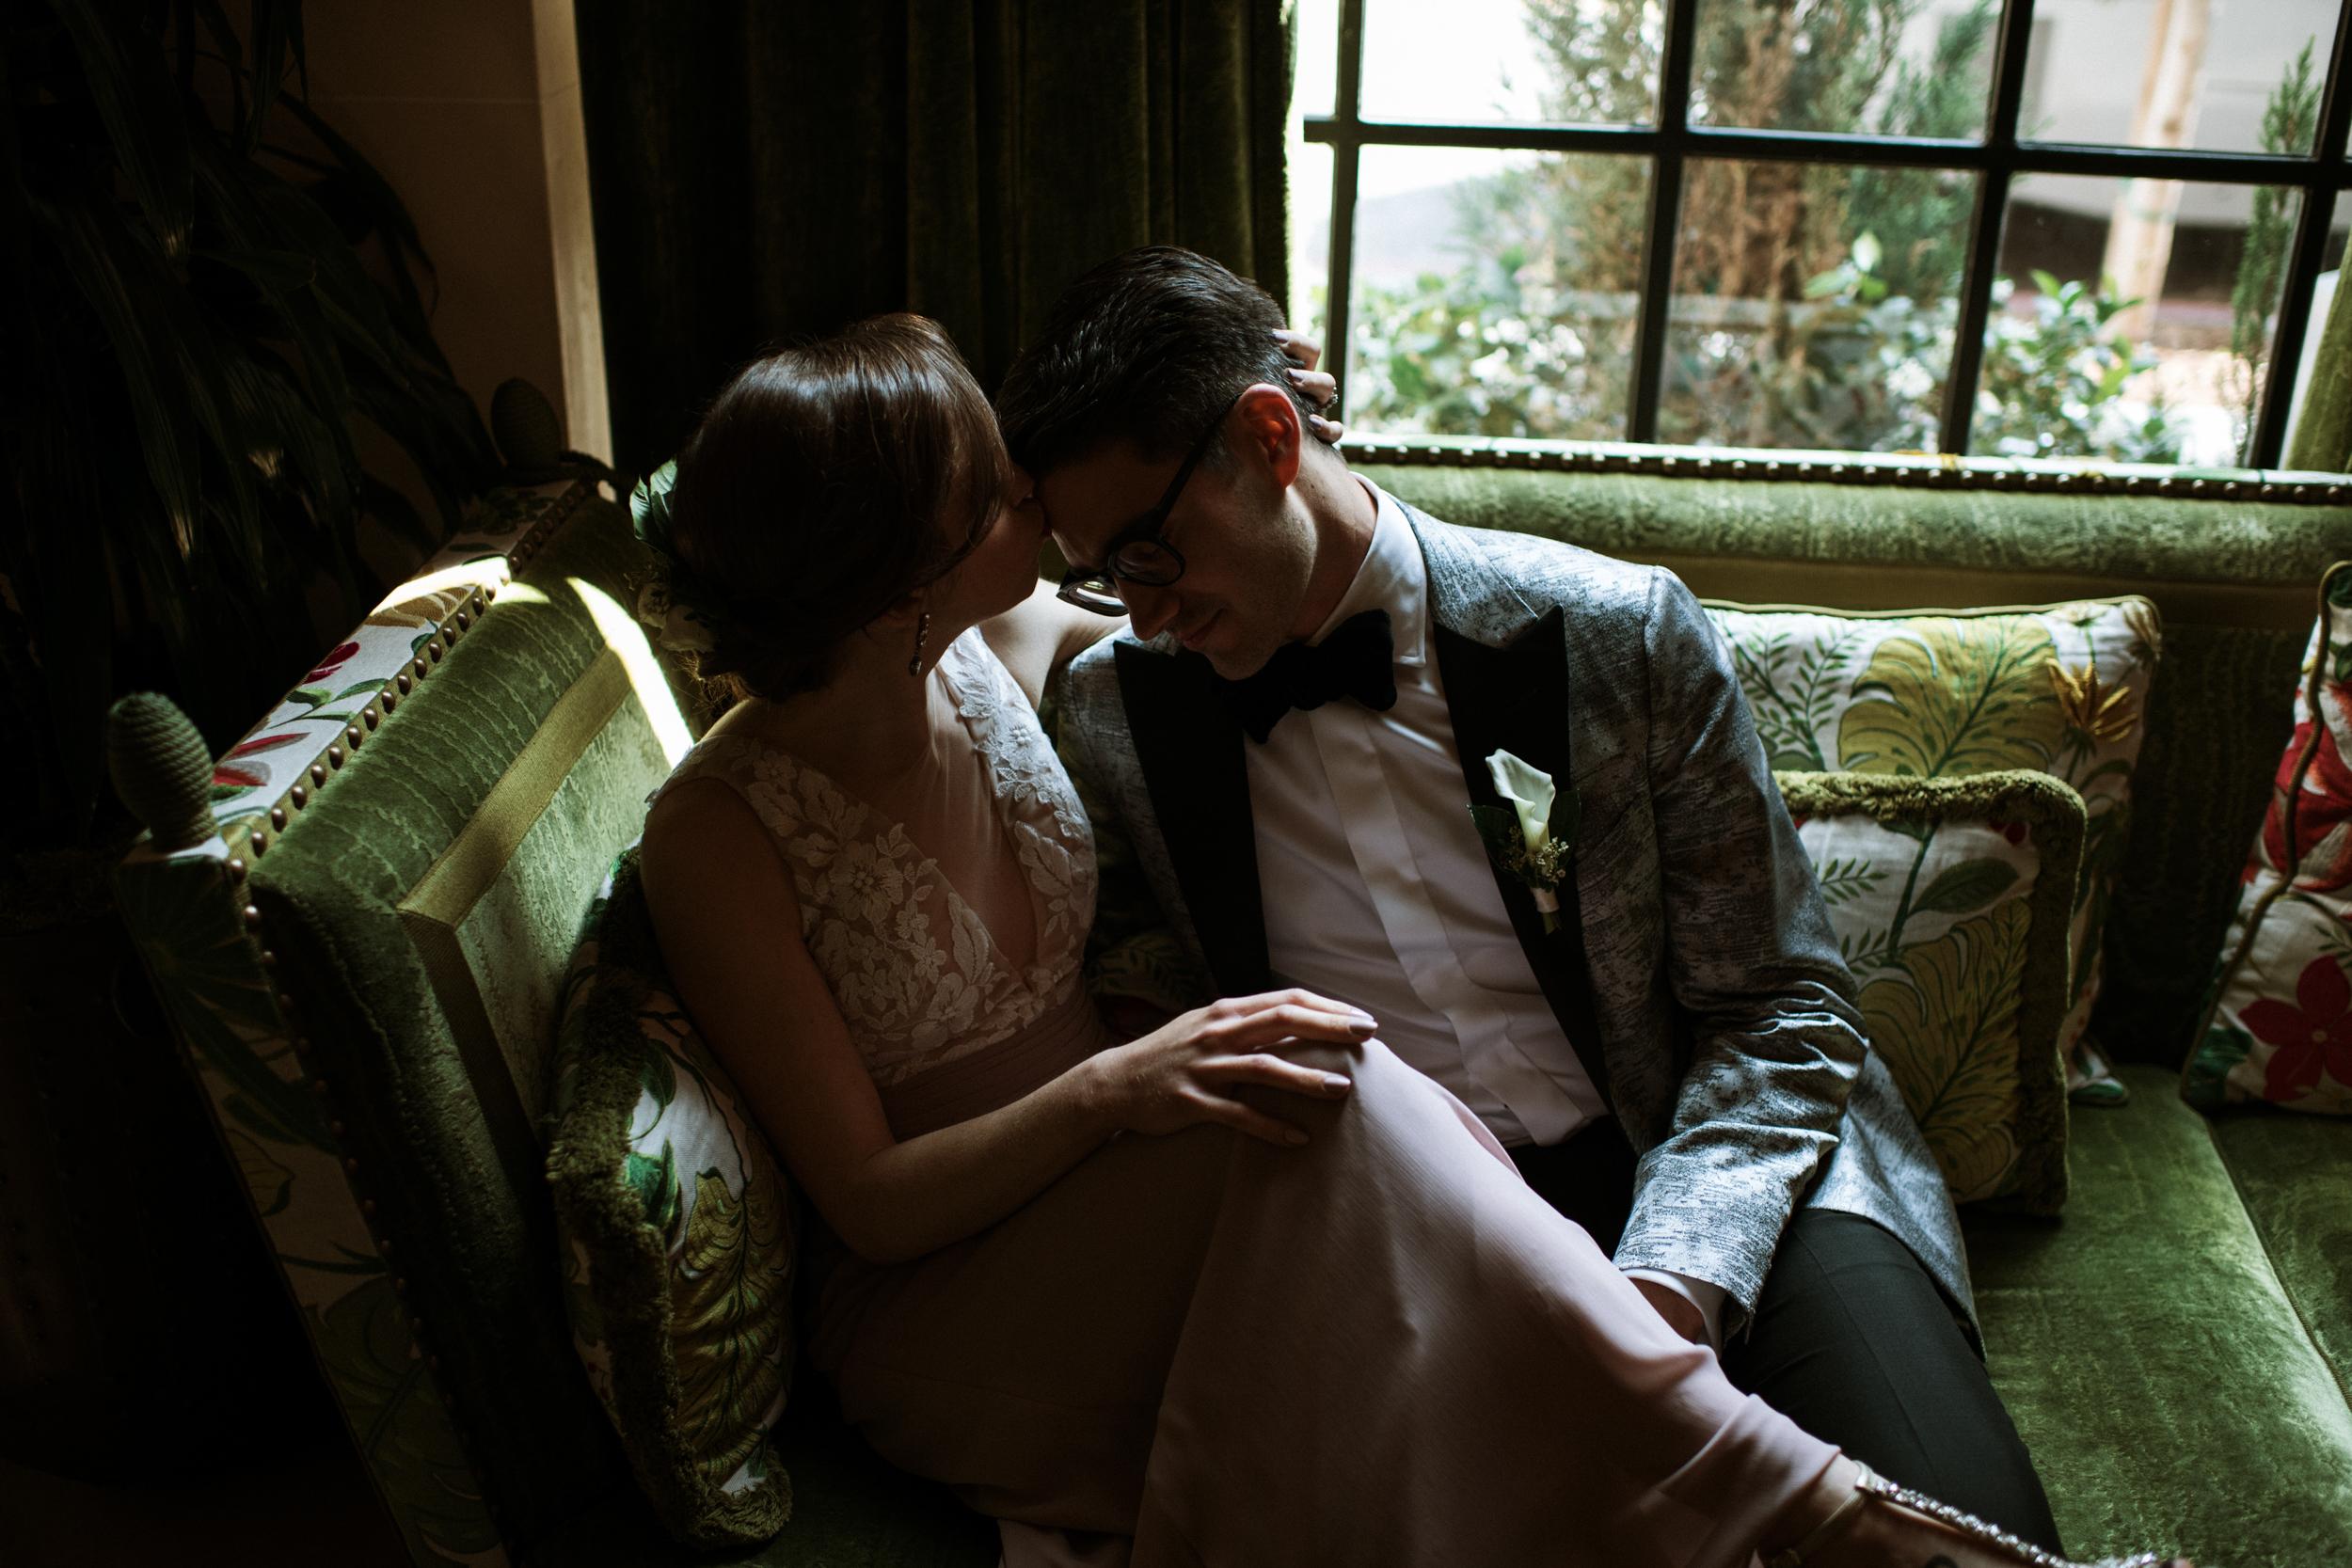 wedding_millwick_los_angeles-16.jpg